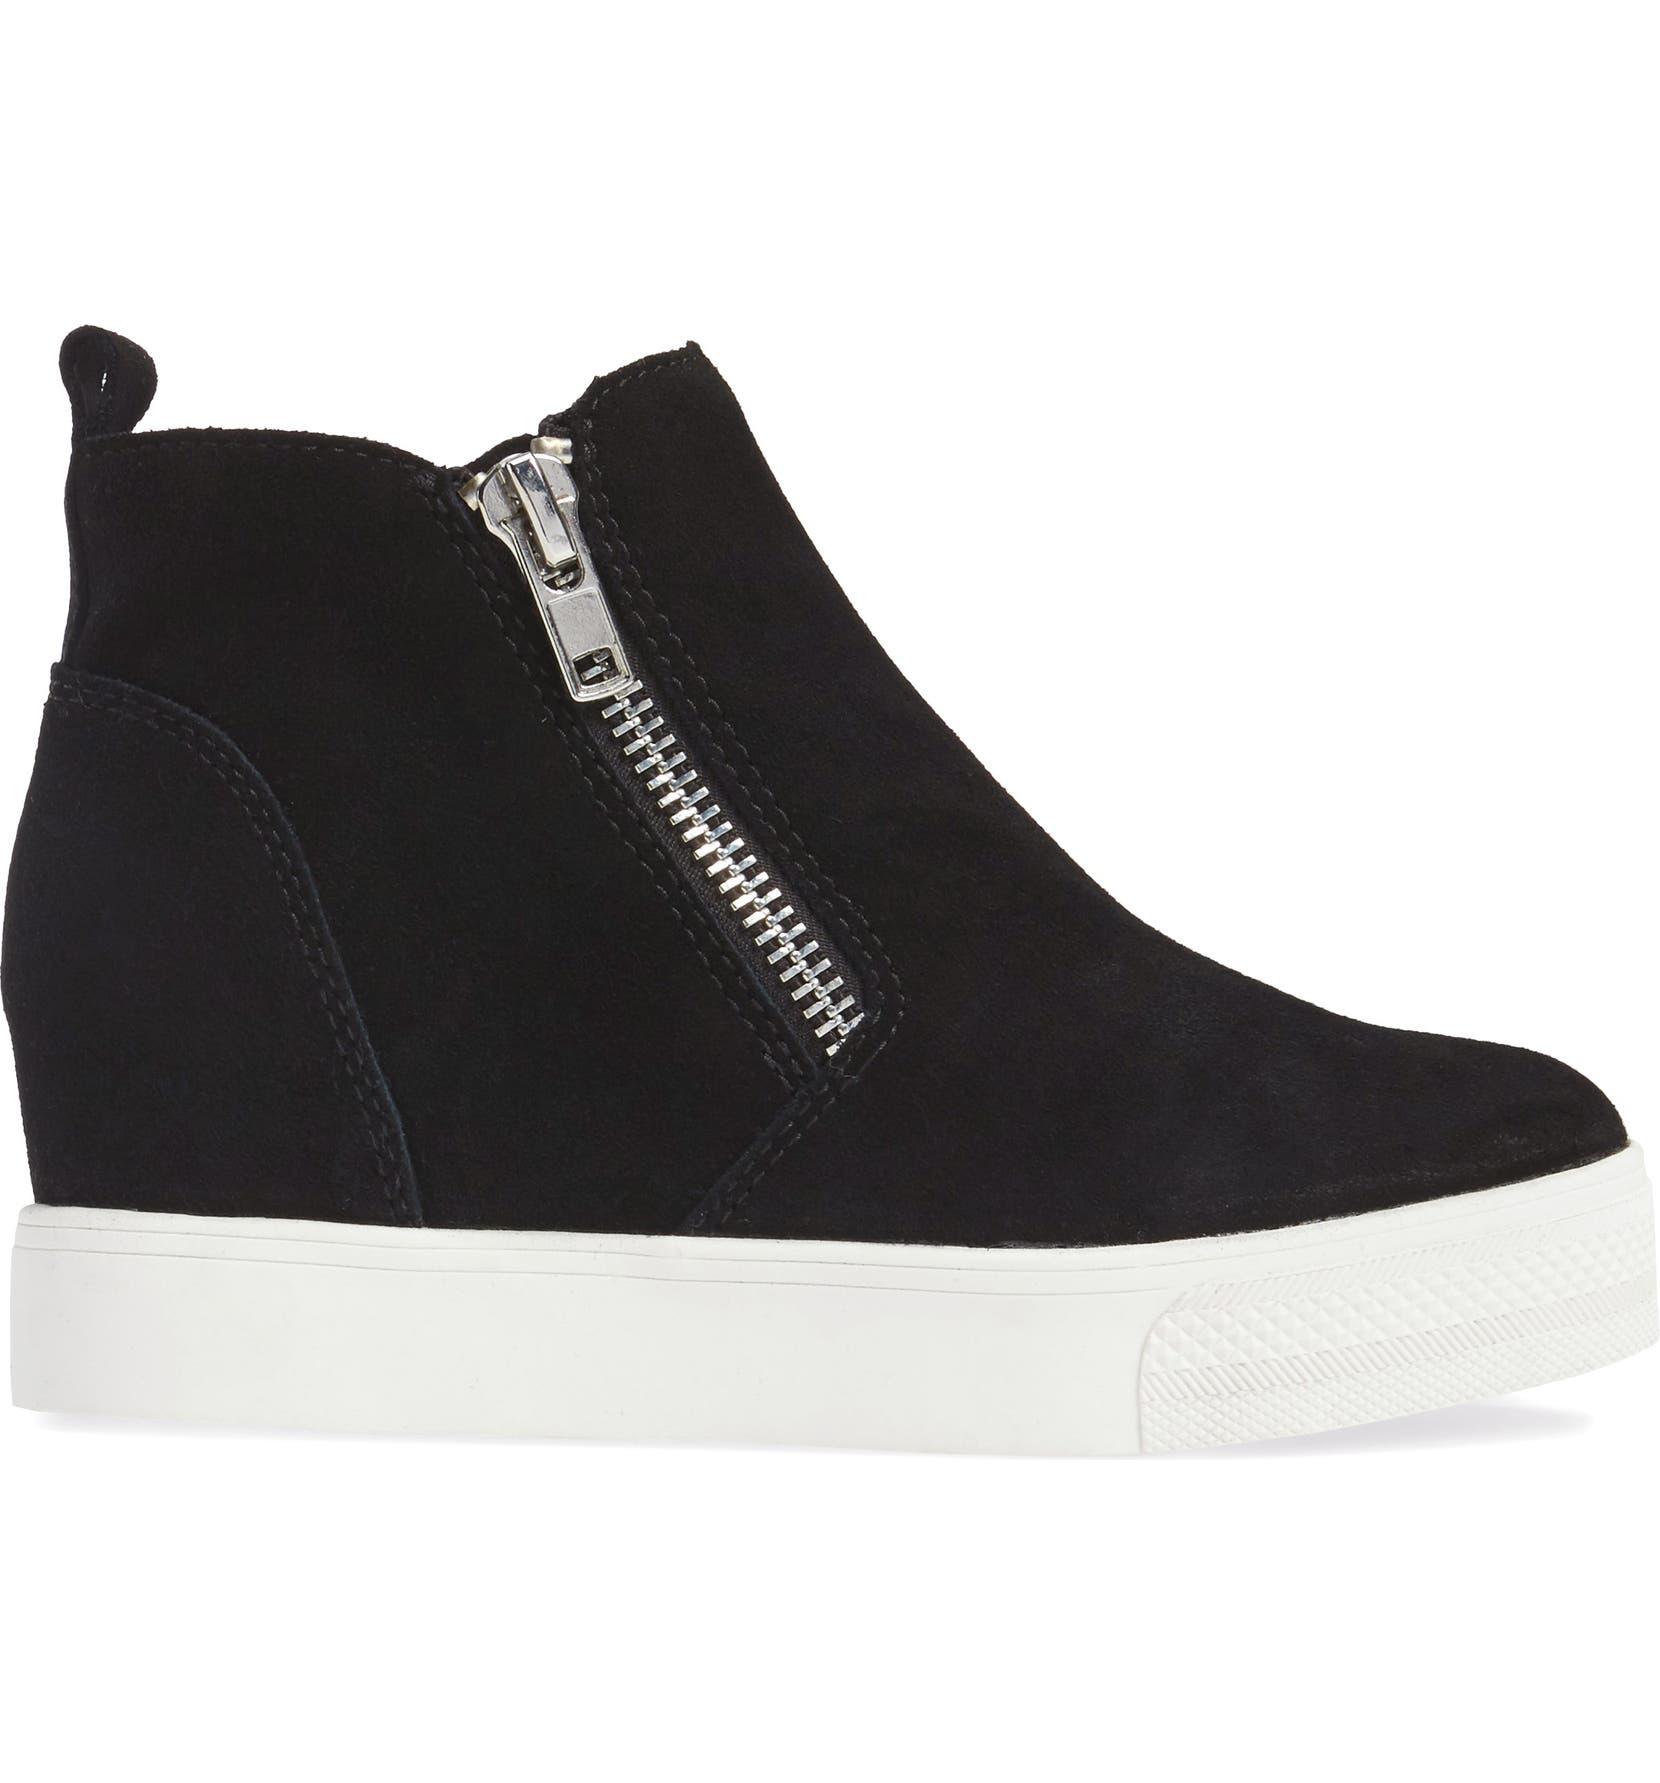 d632382ccf1 Wedgie High Top Platform Sneaker